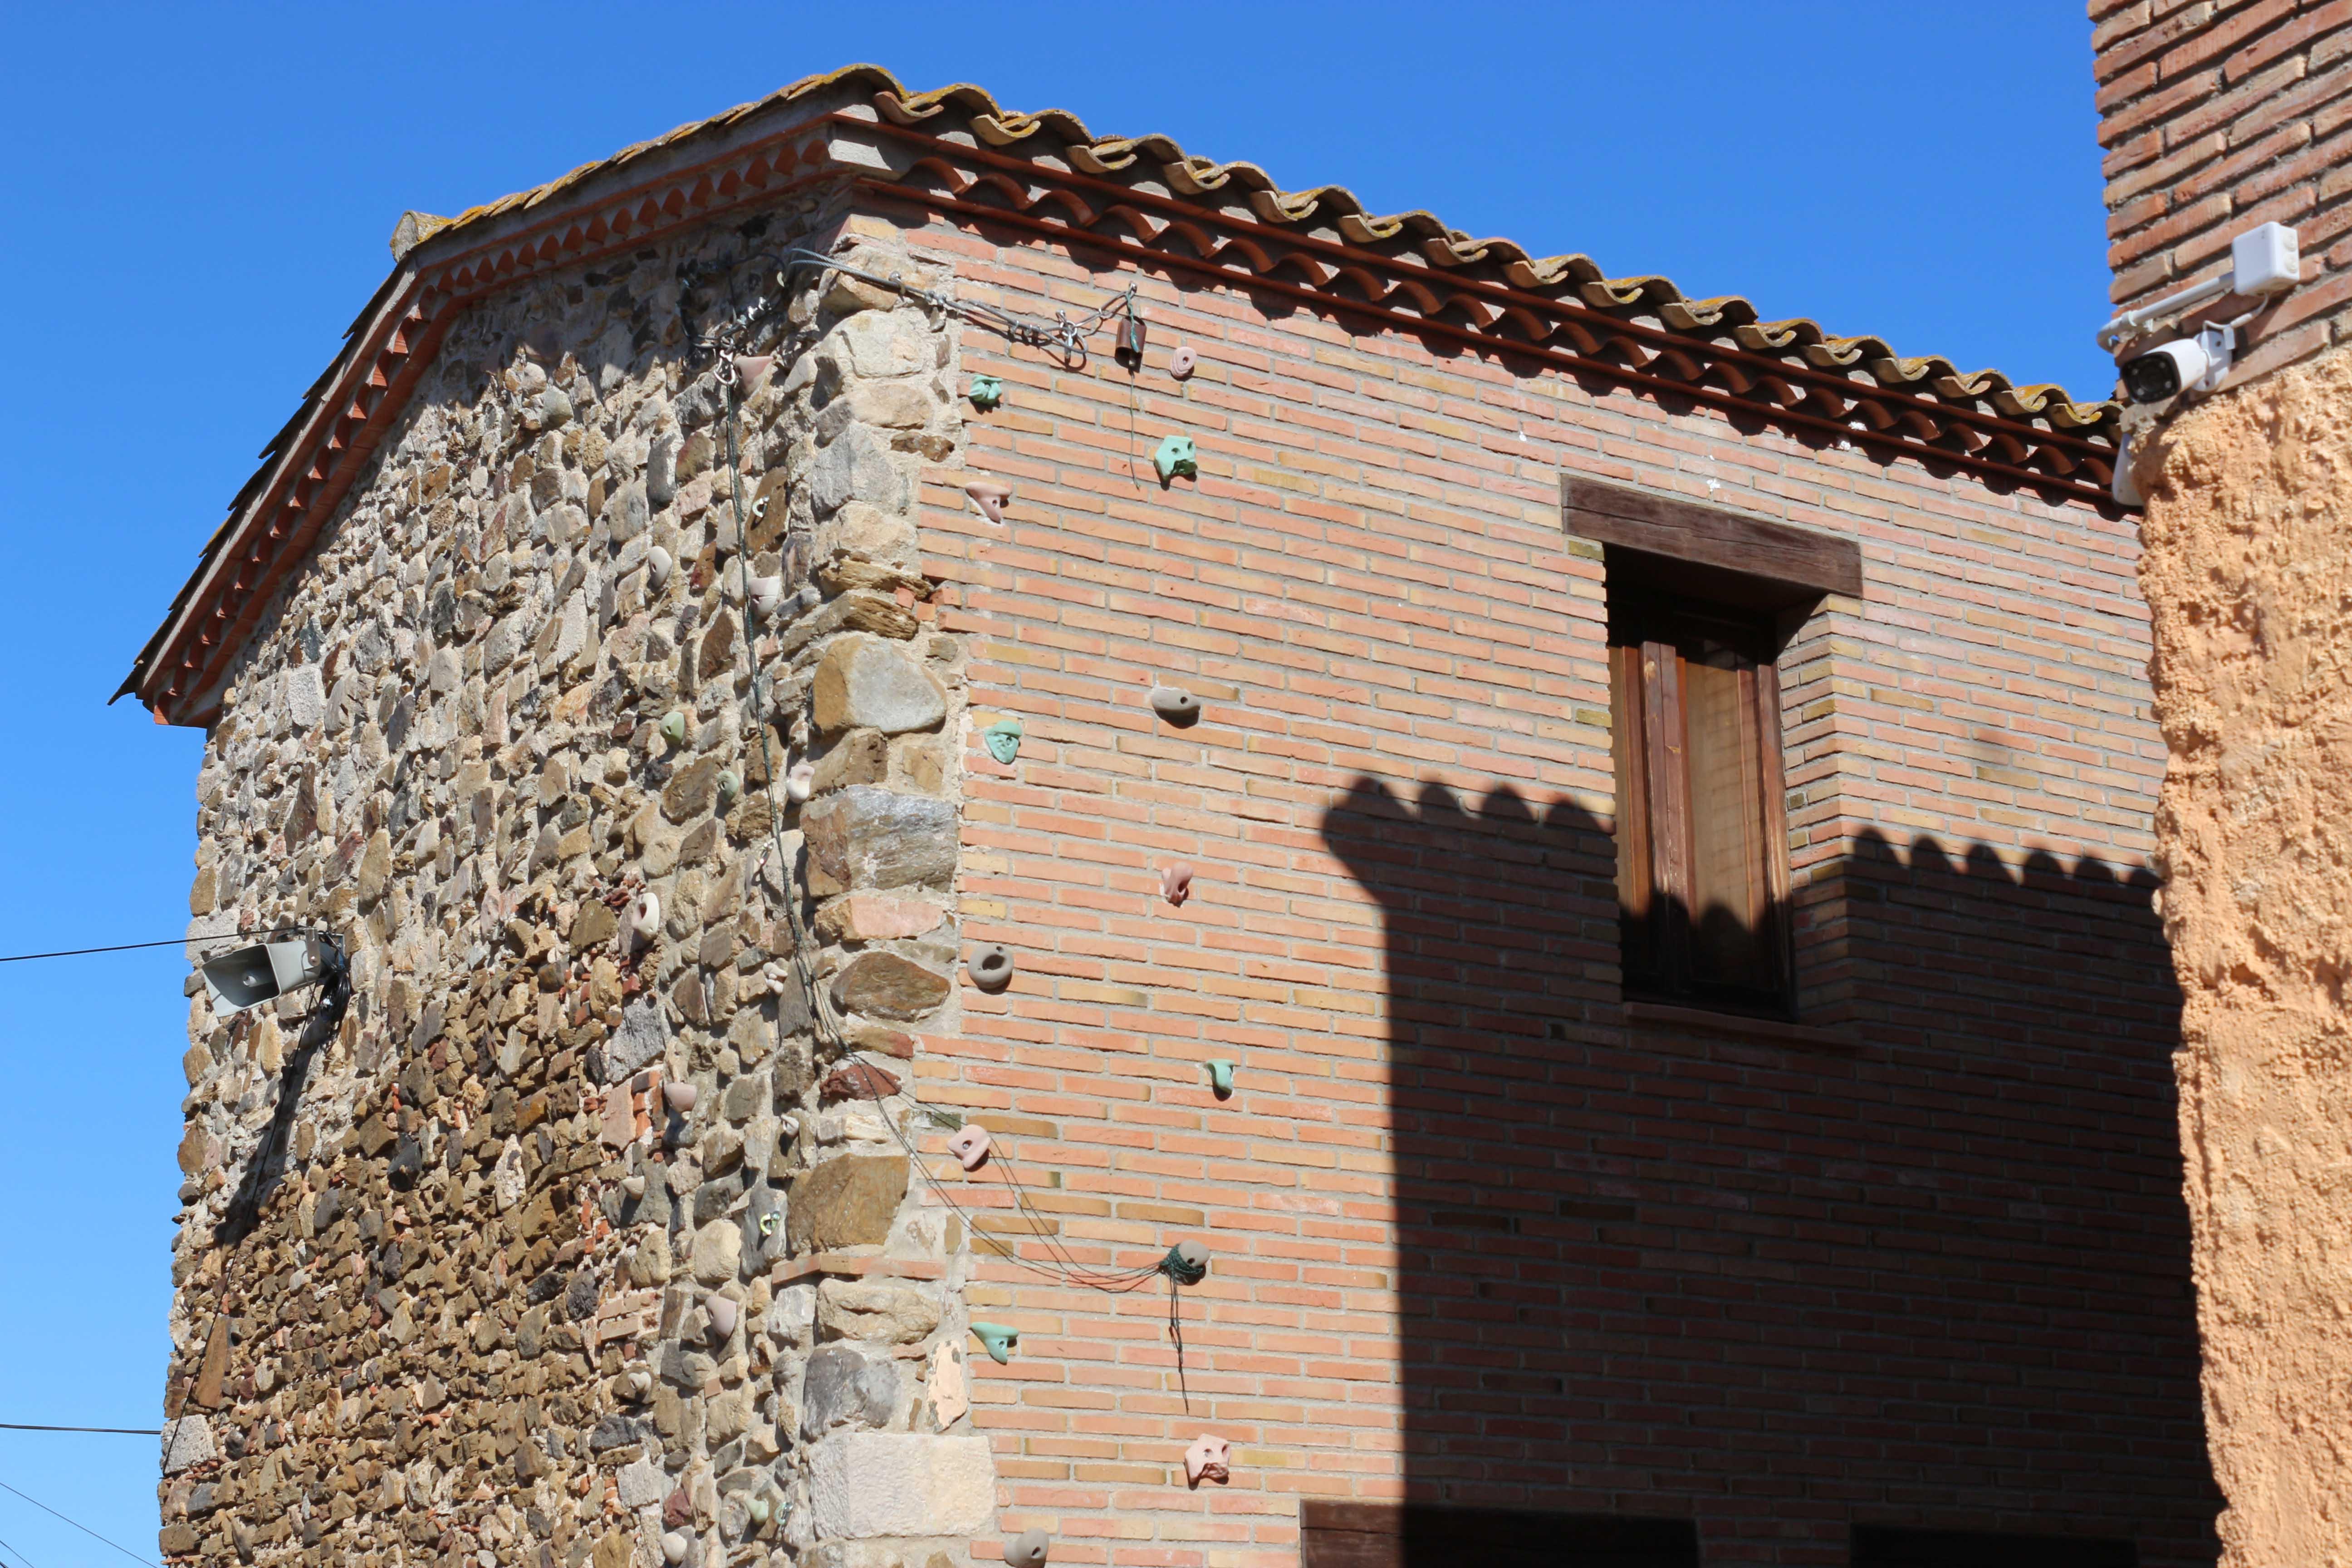 Façana lateral de la casa